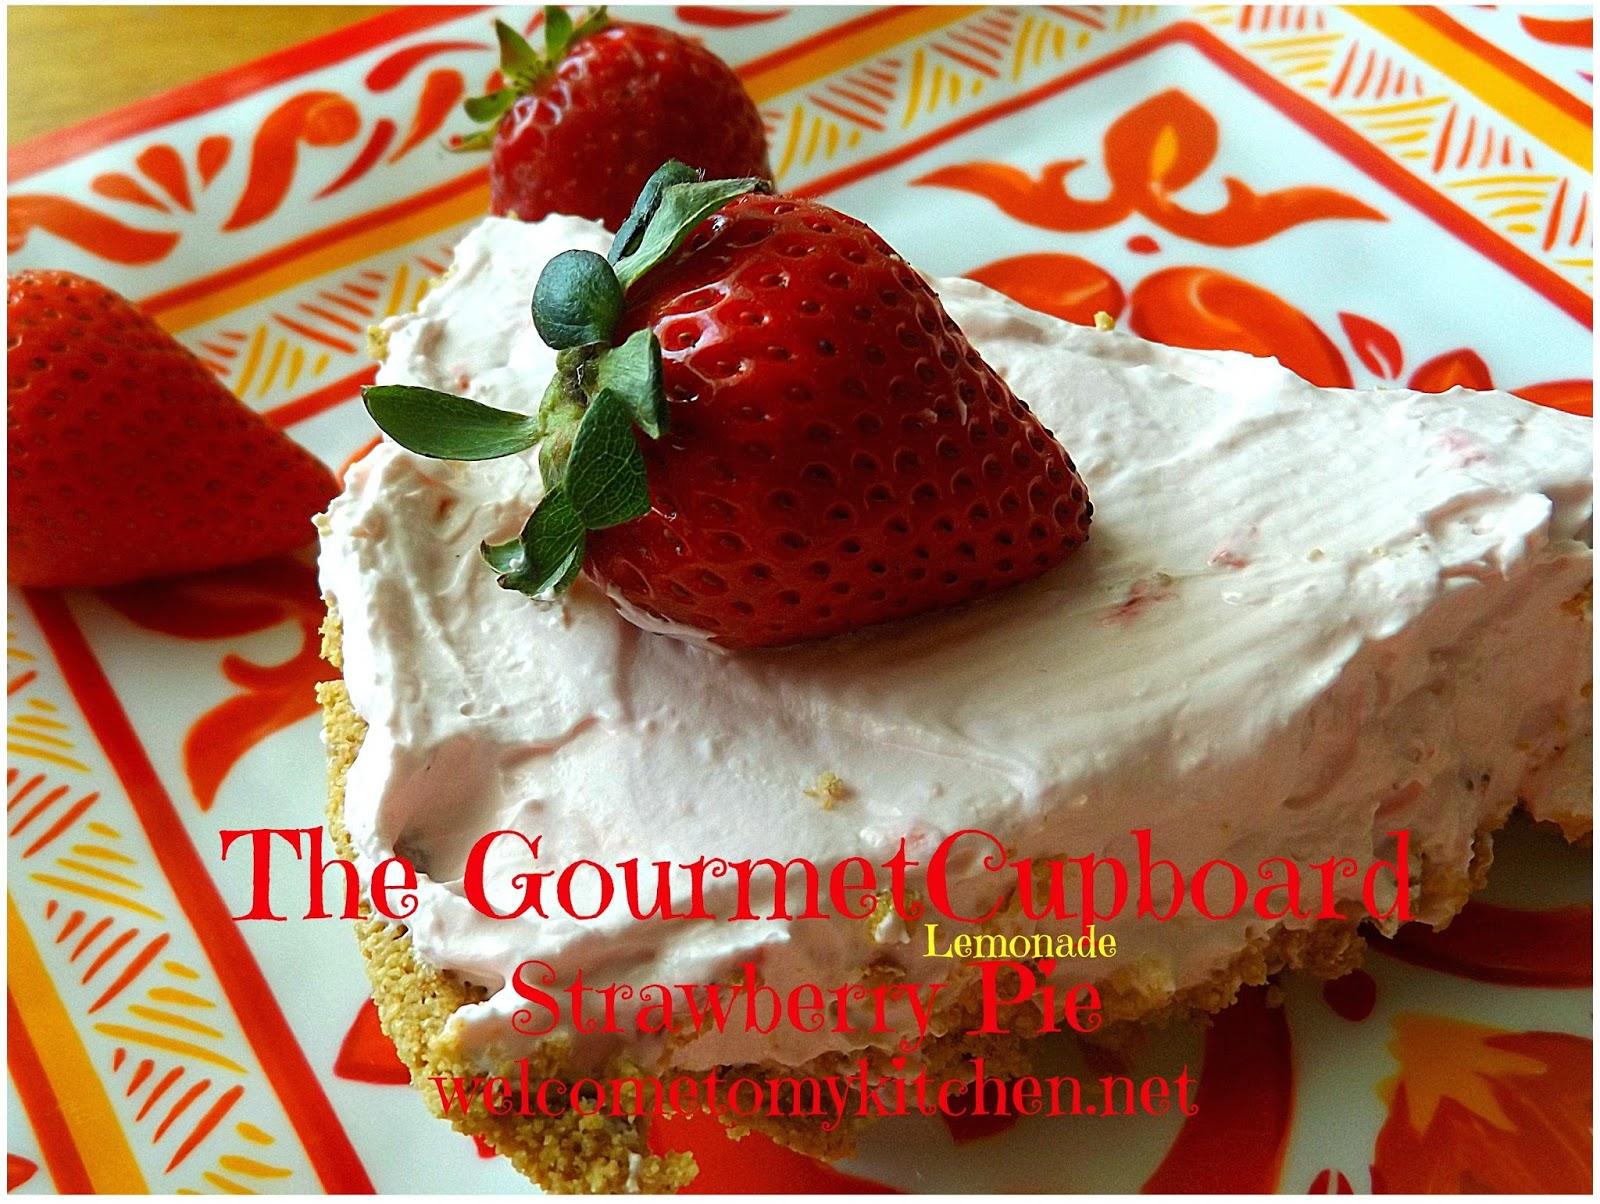 gourmet cupboard mixes giveaway